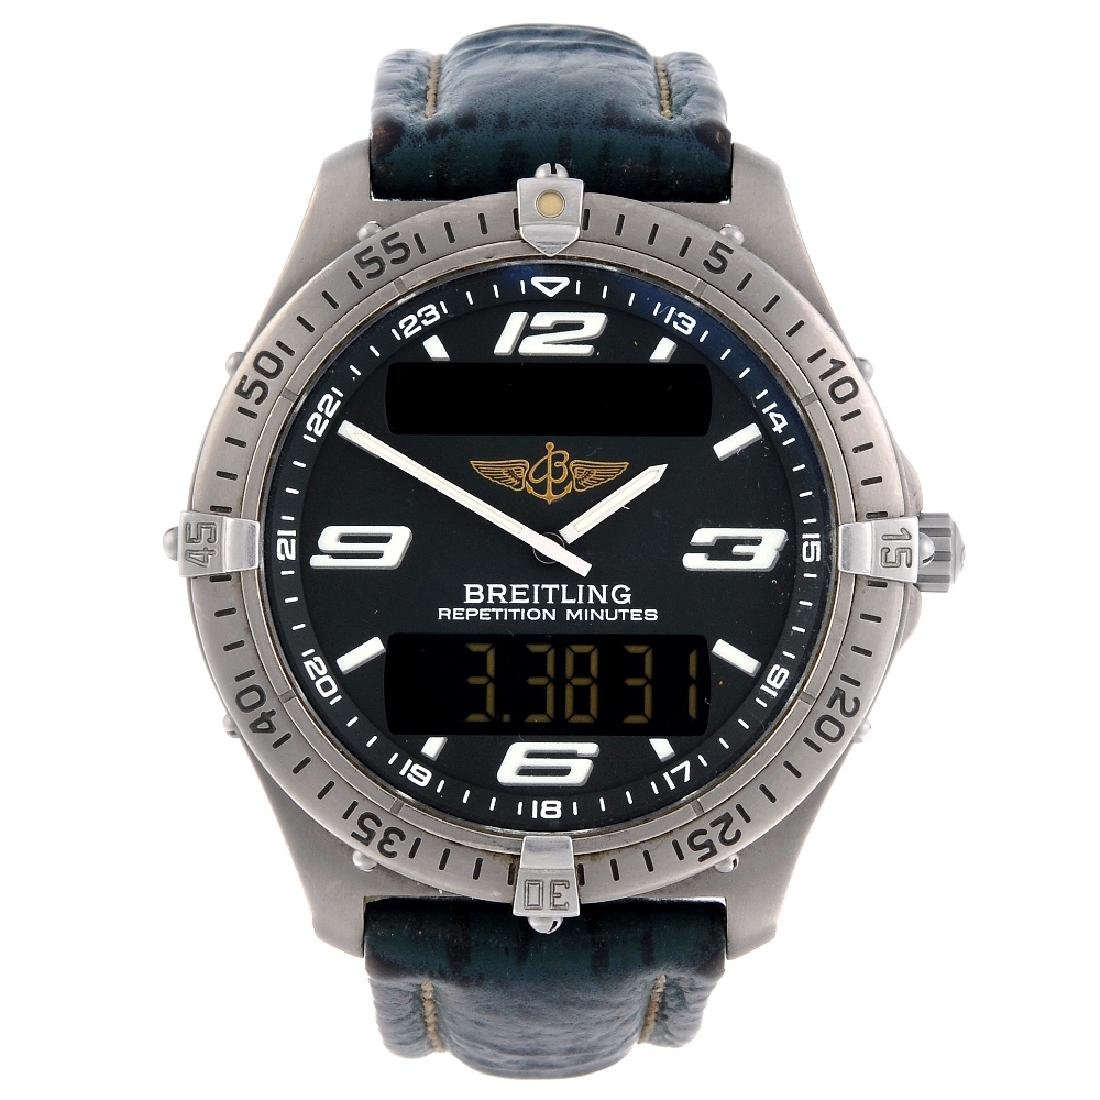 BREITLING - a gentleman's Aerospace wrist watch.